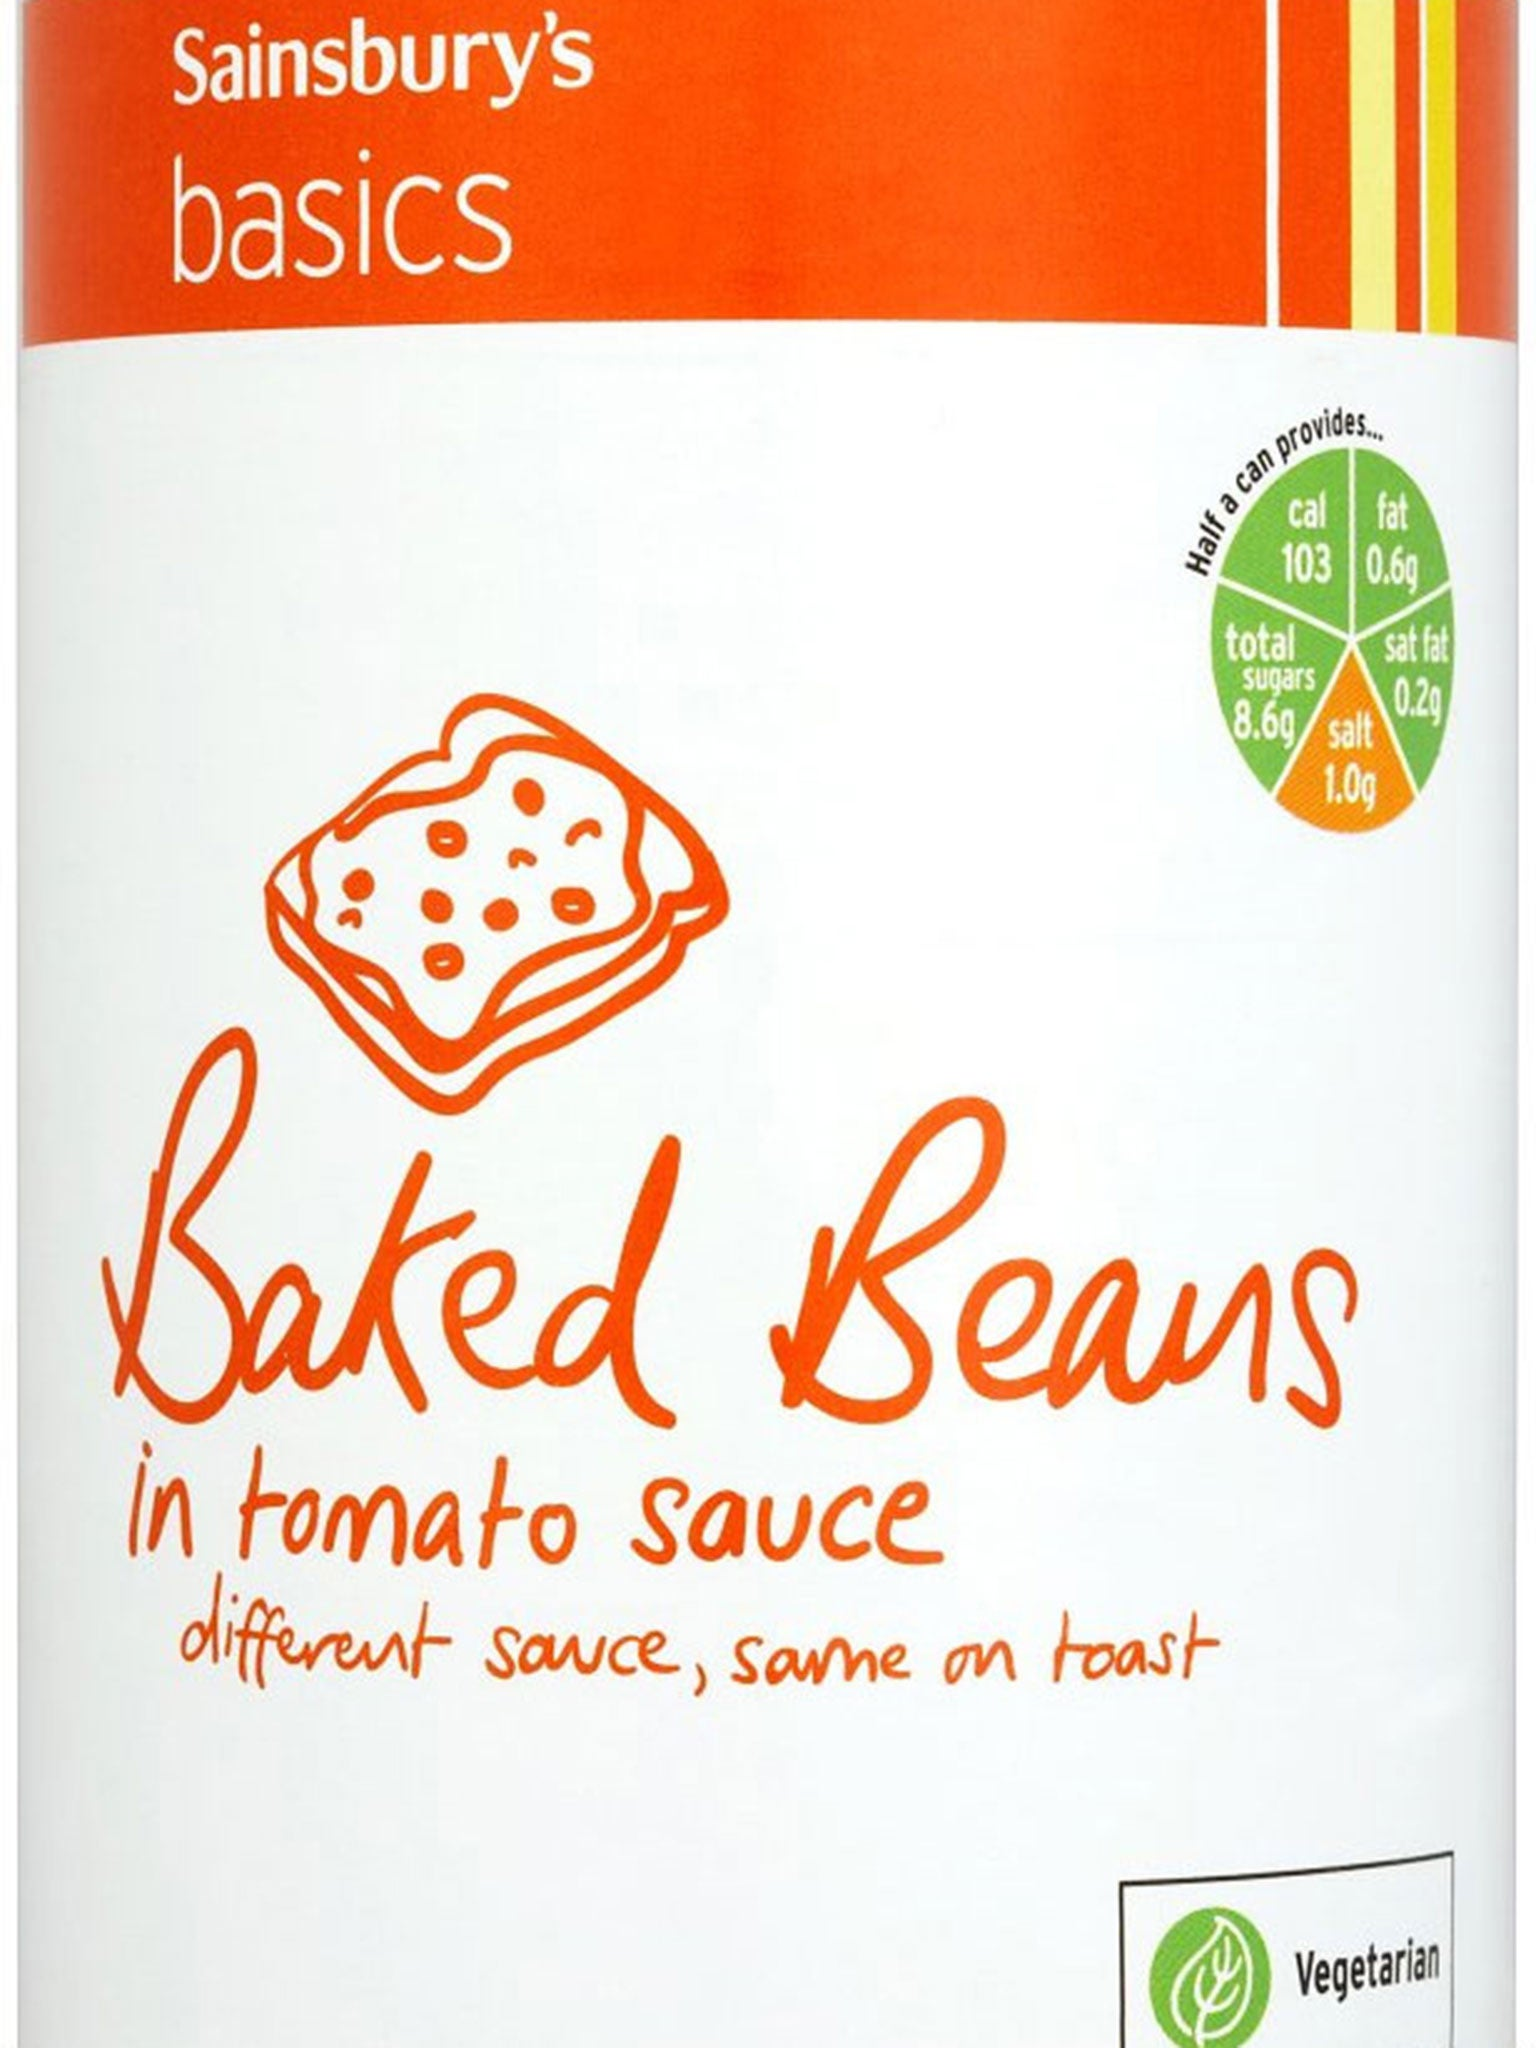 Sainsbury\'s Basics range has cornered the market in self-deprecation ...